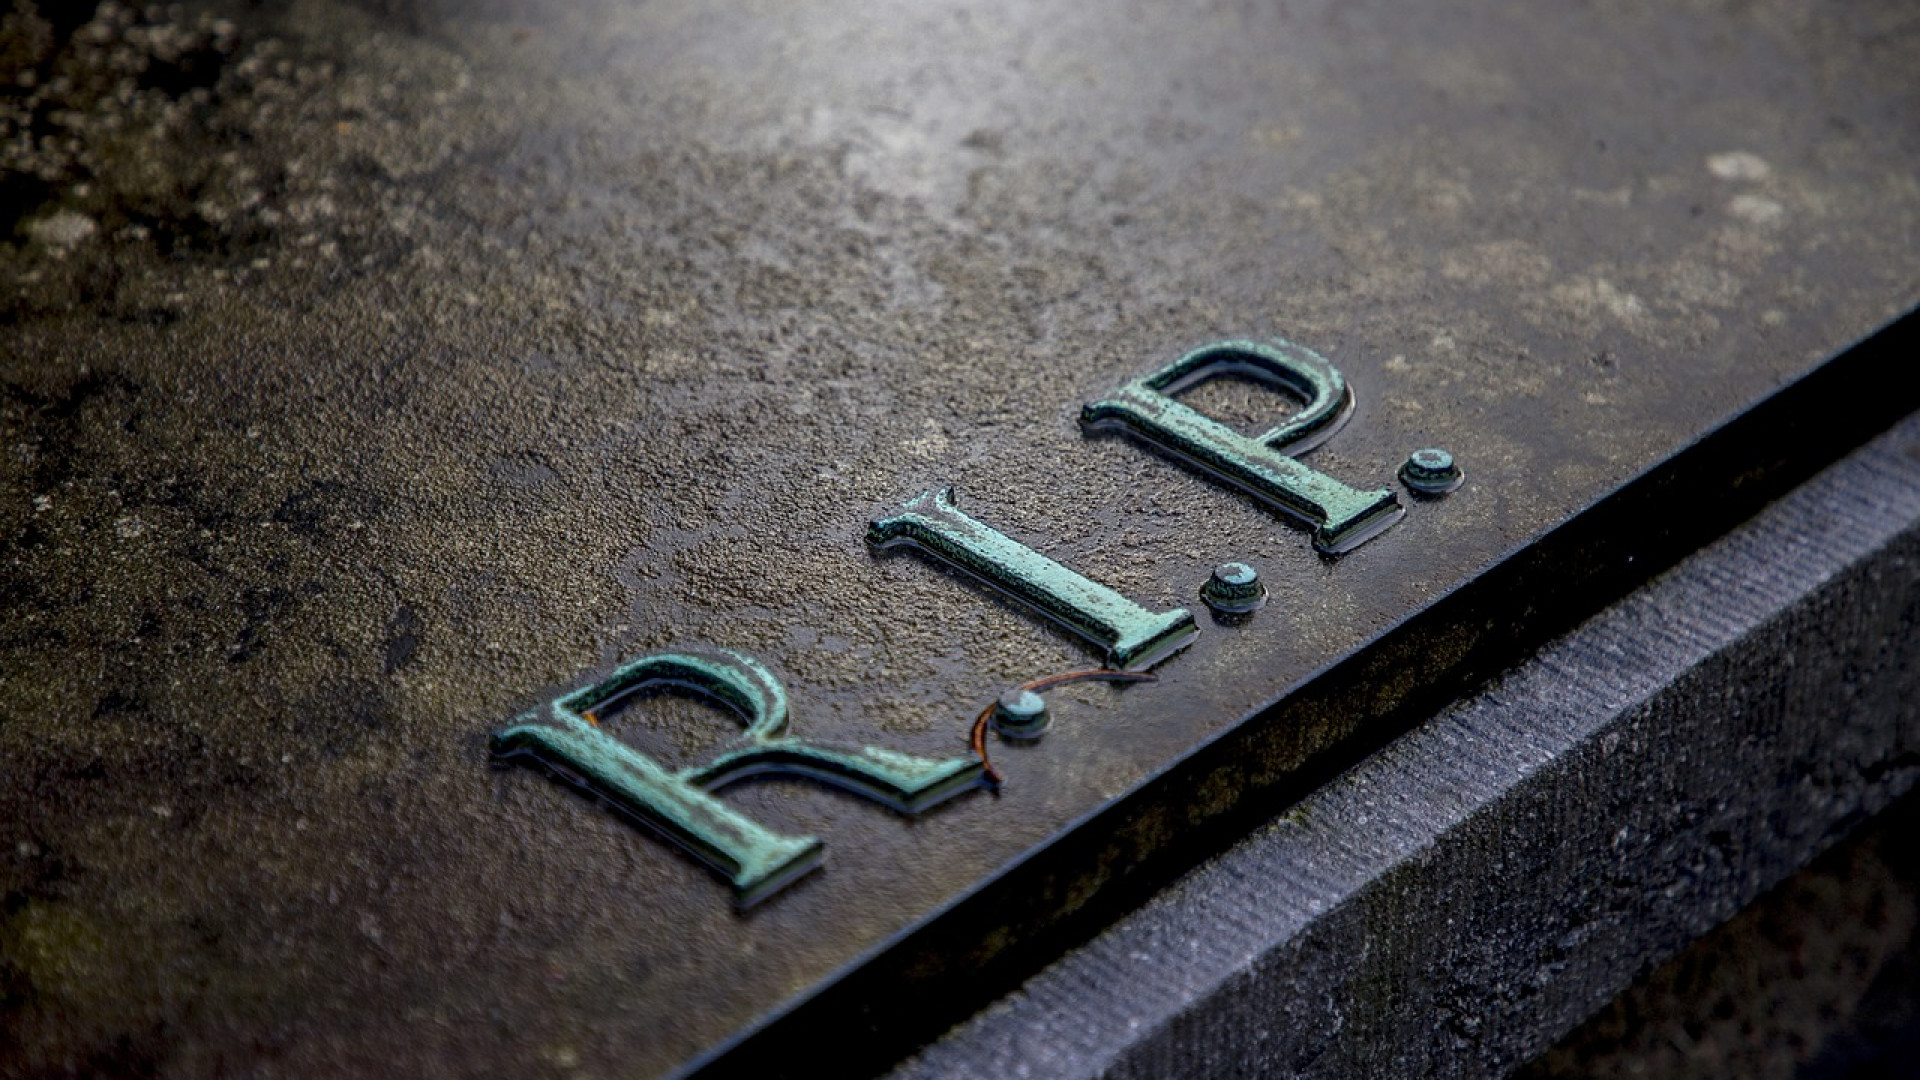 Quand utiliser l'acronyme RIP (Rest In Peace) ?